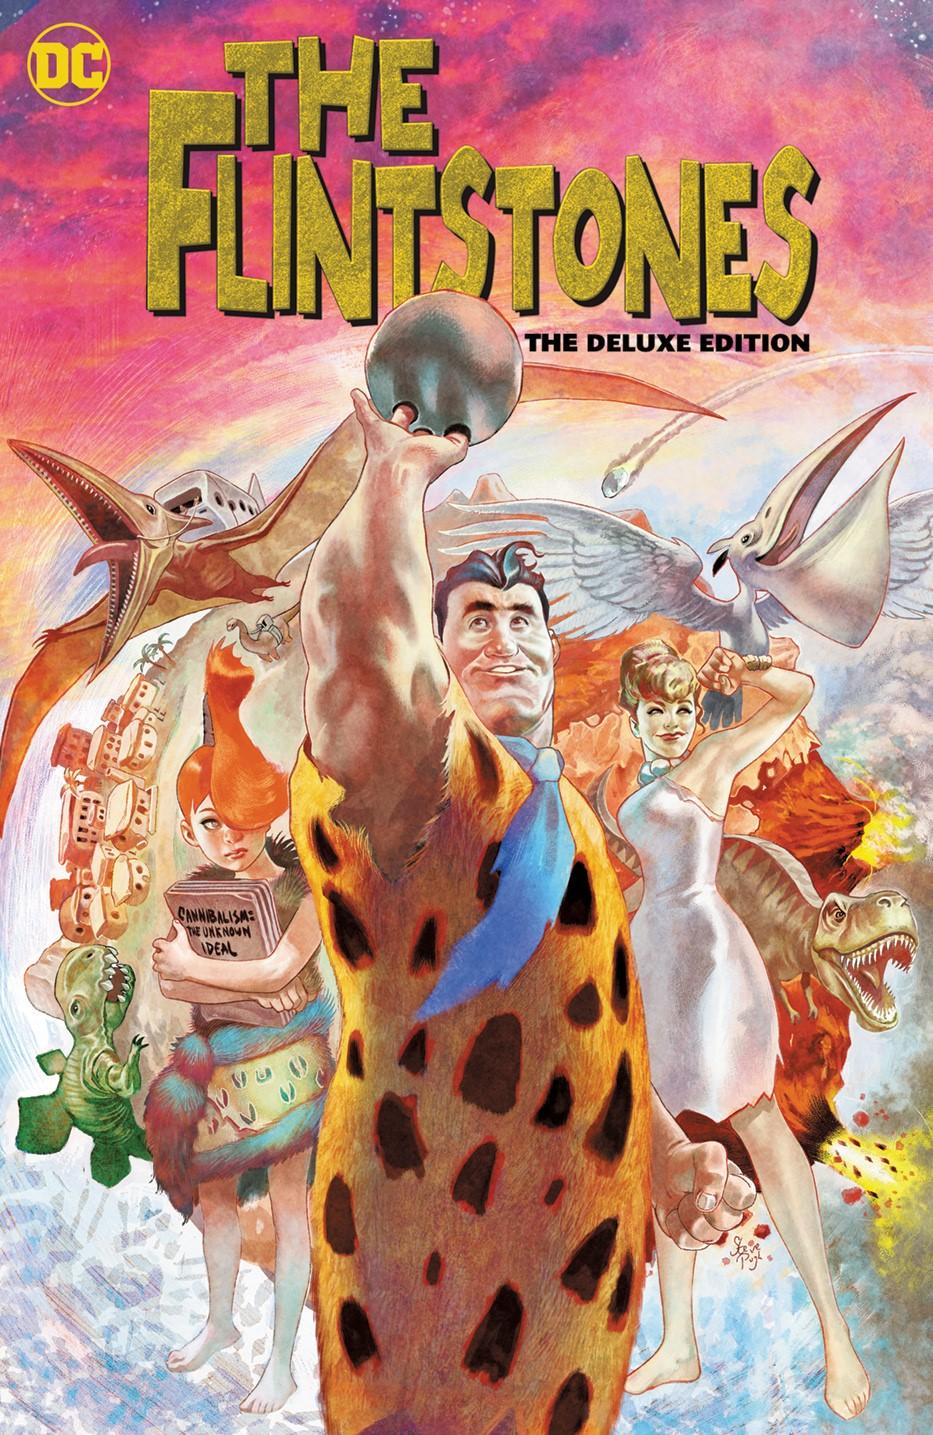 theflintstones-deluxe-edition DC Comics November 2021 Solicitations